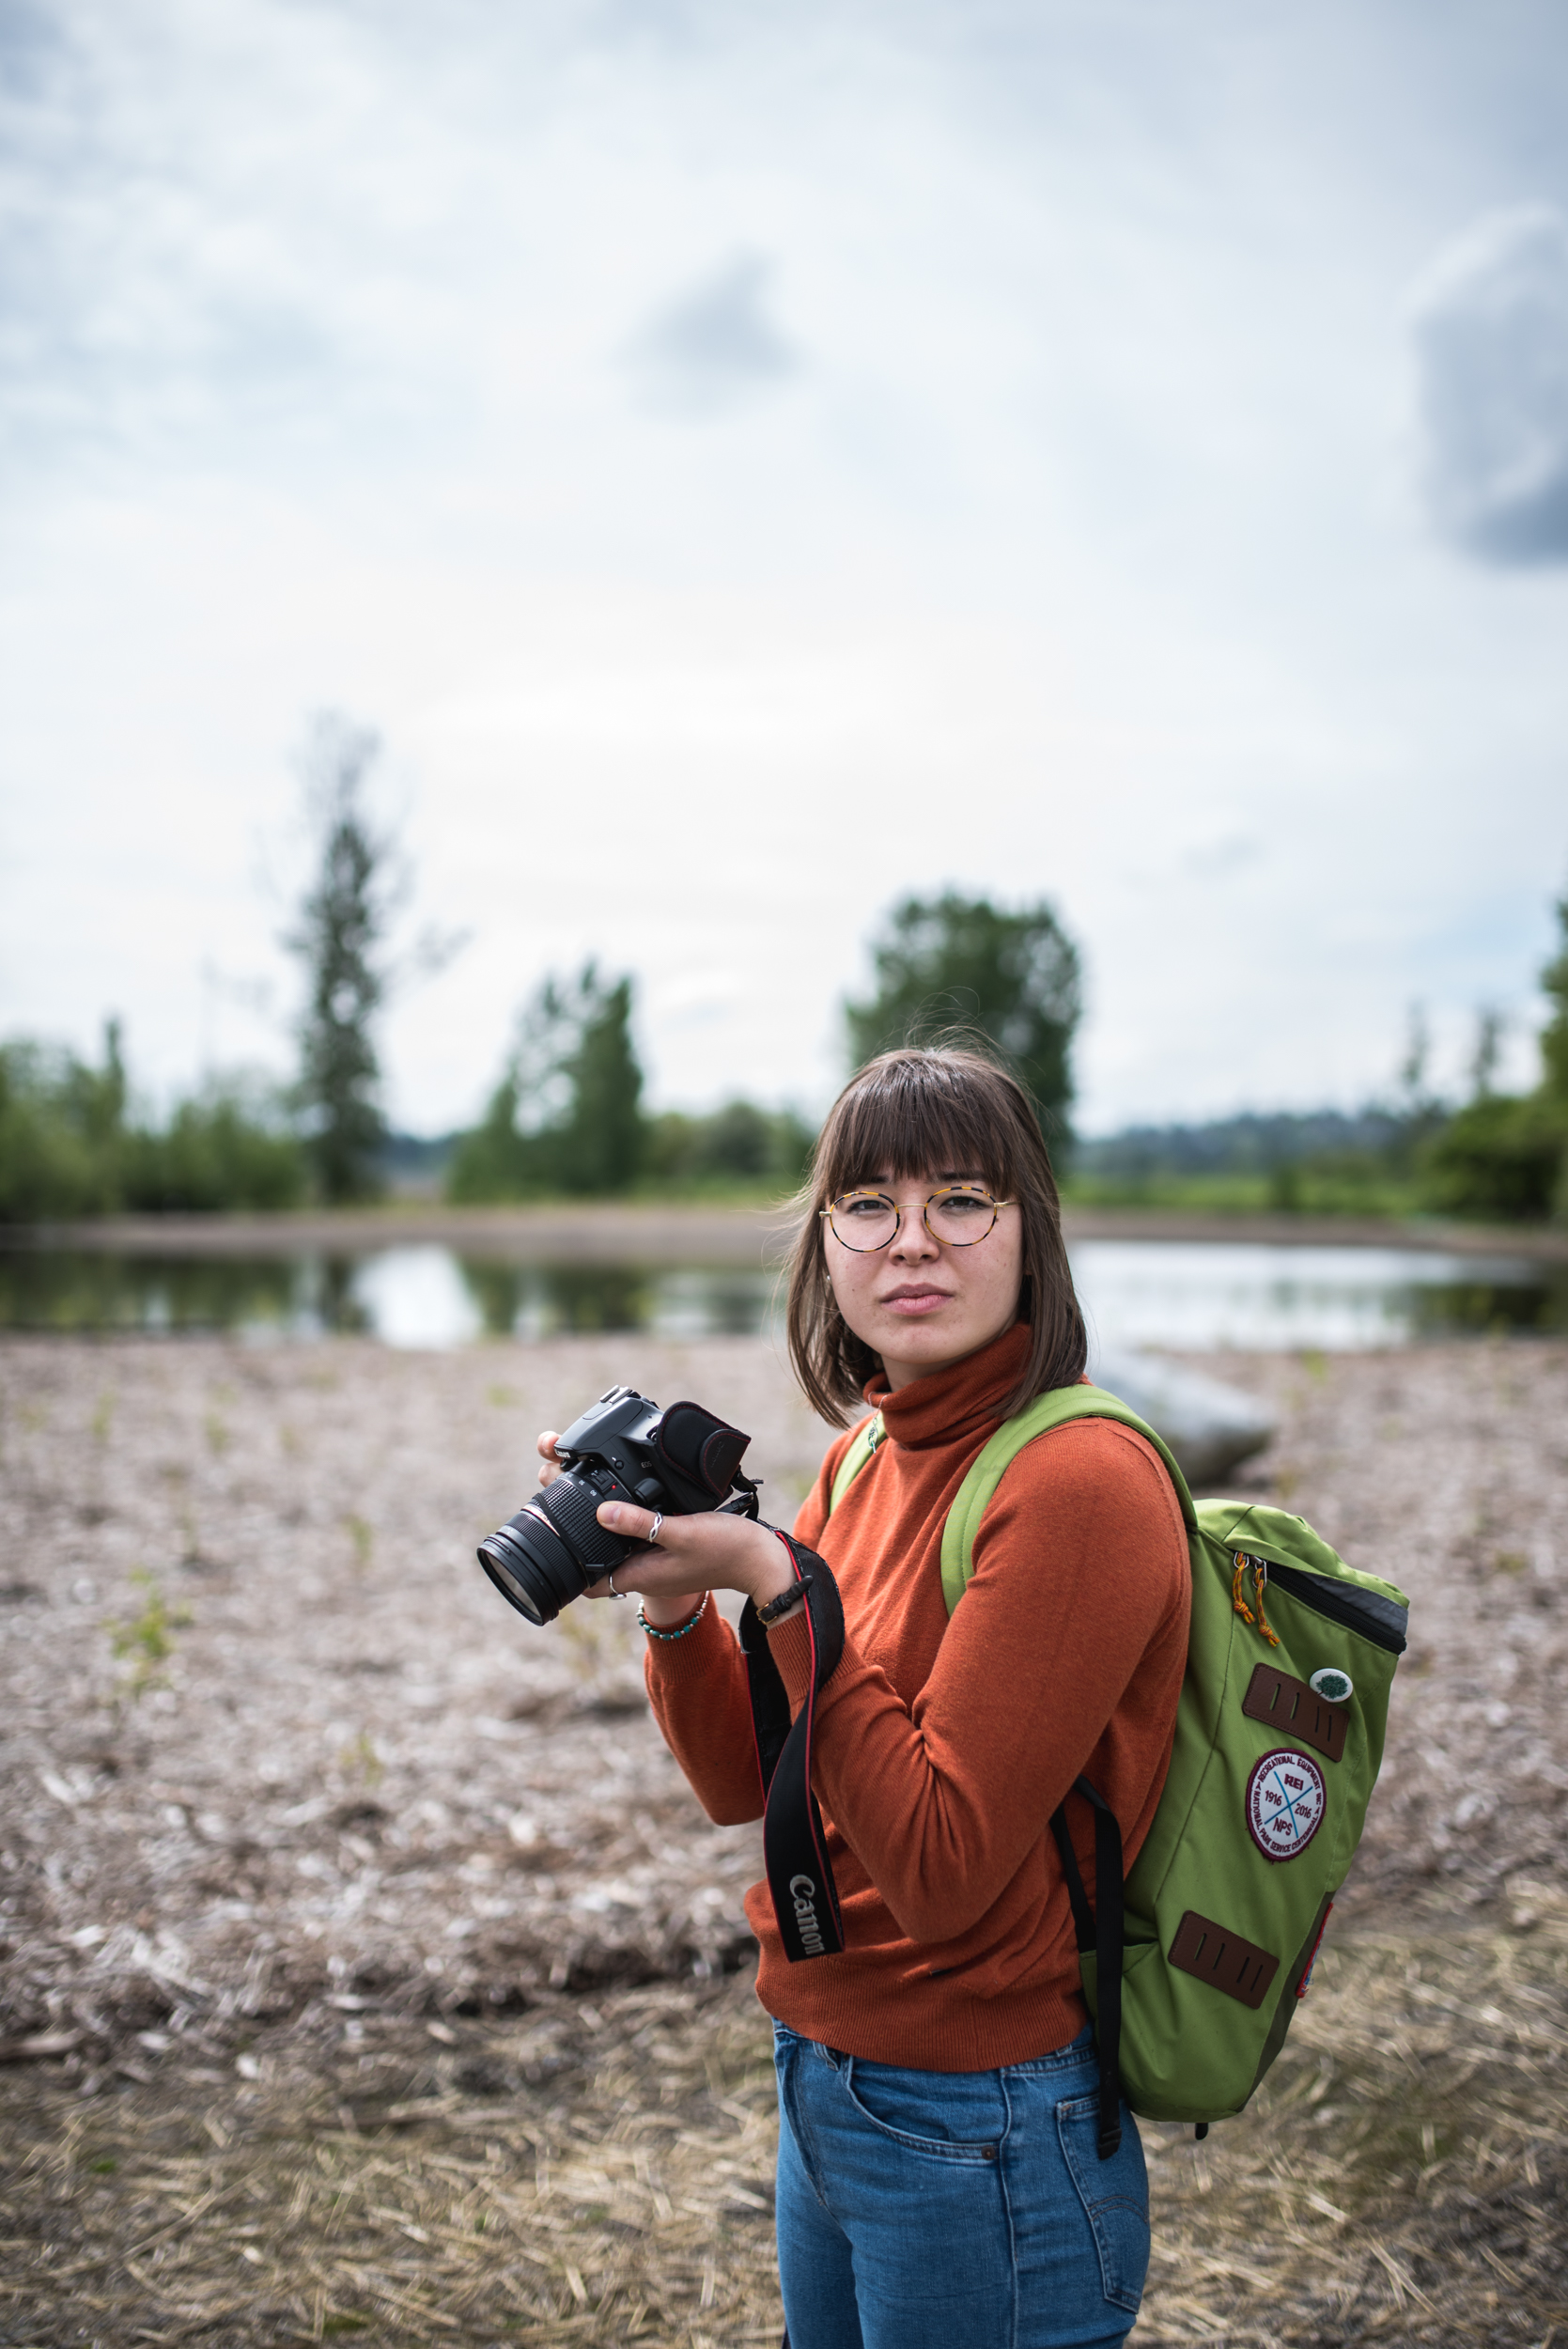 05-18-17 Portraits_4316.jpg